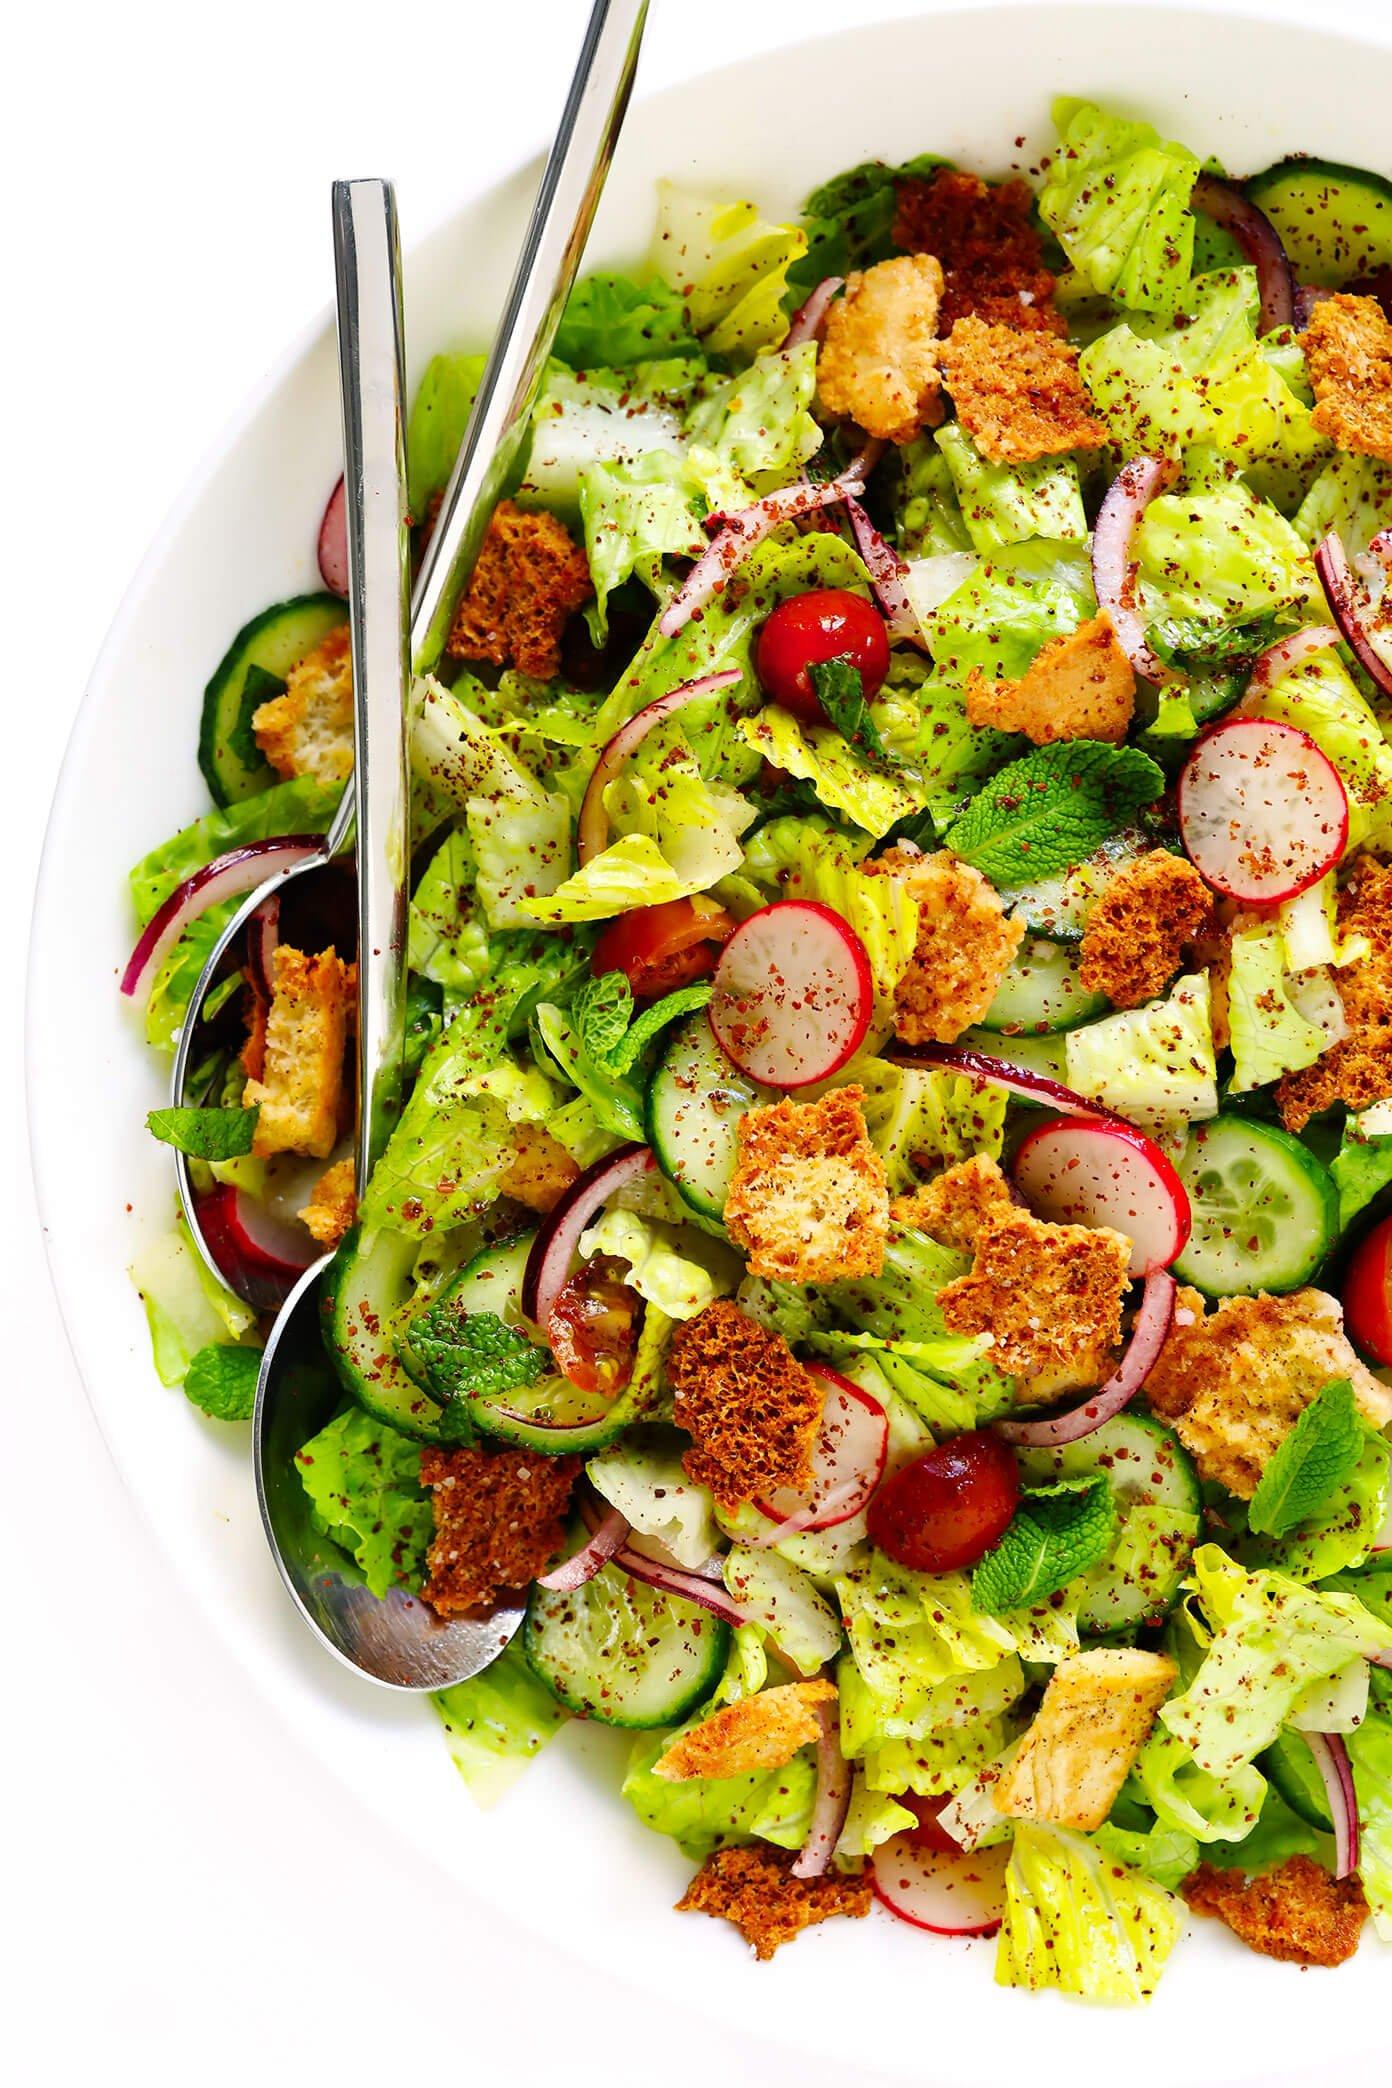 Best Fattoush Salad Recipe with Pita Croutons